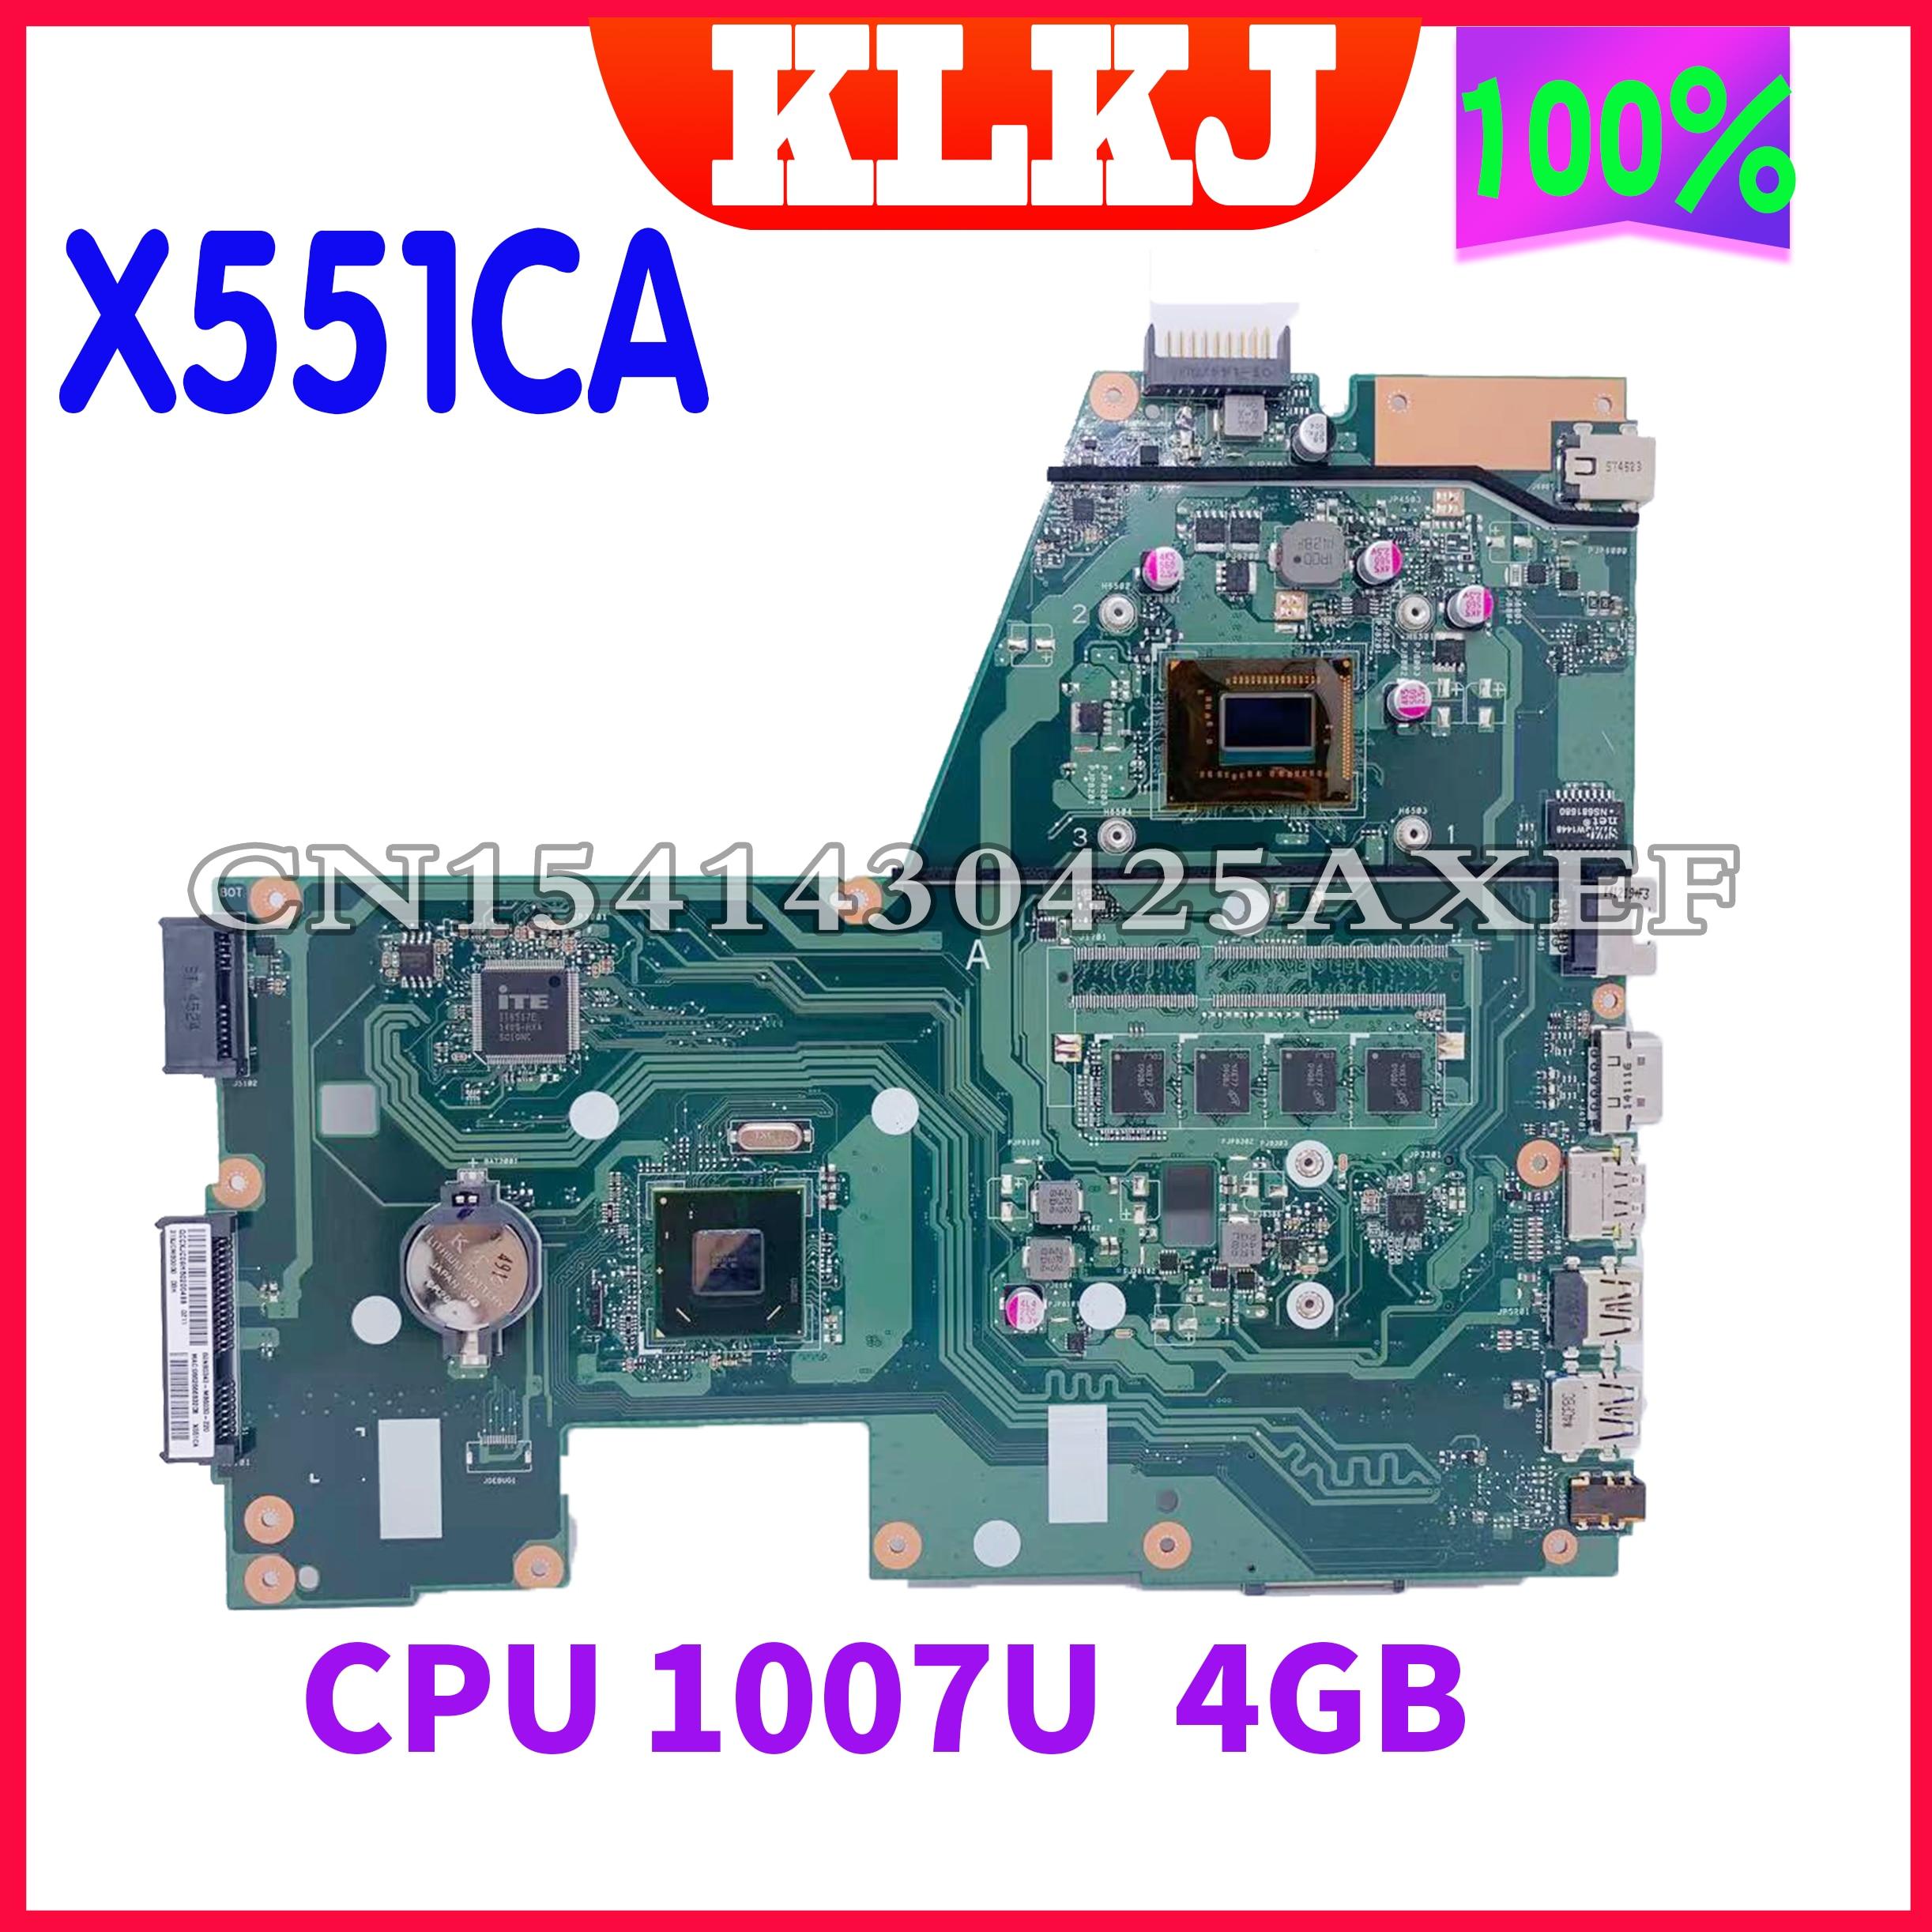 Dinzi جديد X551CA اللوحة الأم الأصلي ل ASUS X551CAP X551C X551CA اللوحة المحمول 1007U 4GB-RAM دون فتحة الذاكرة